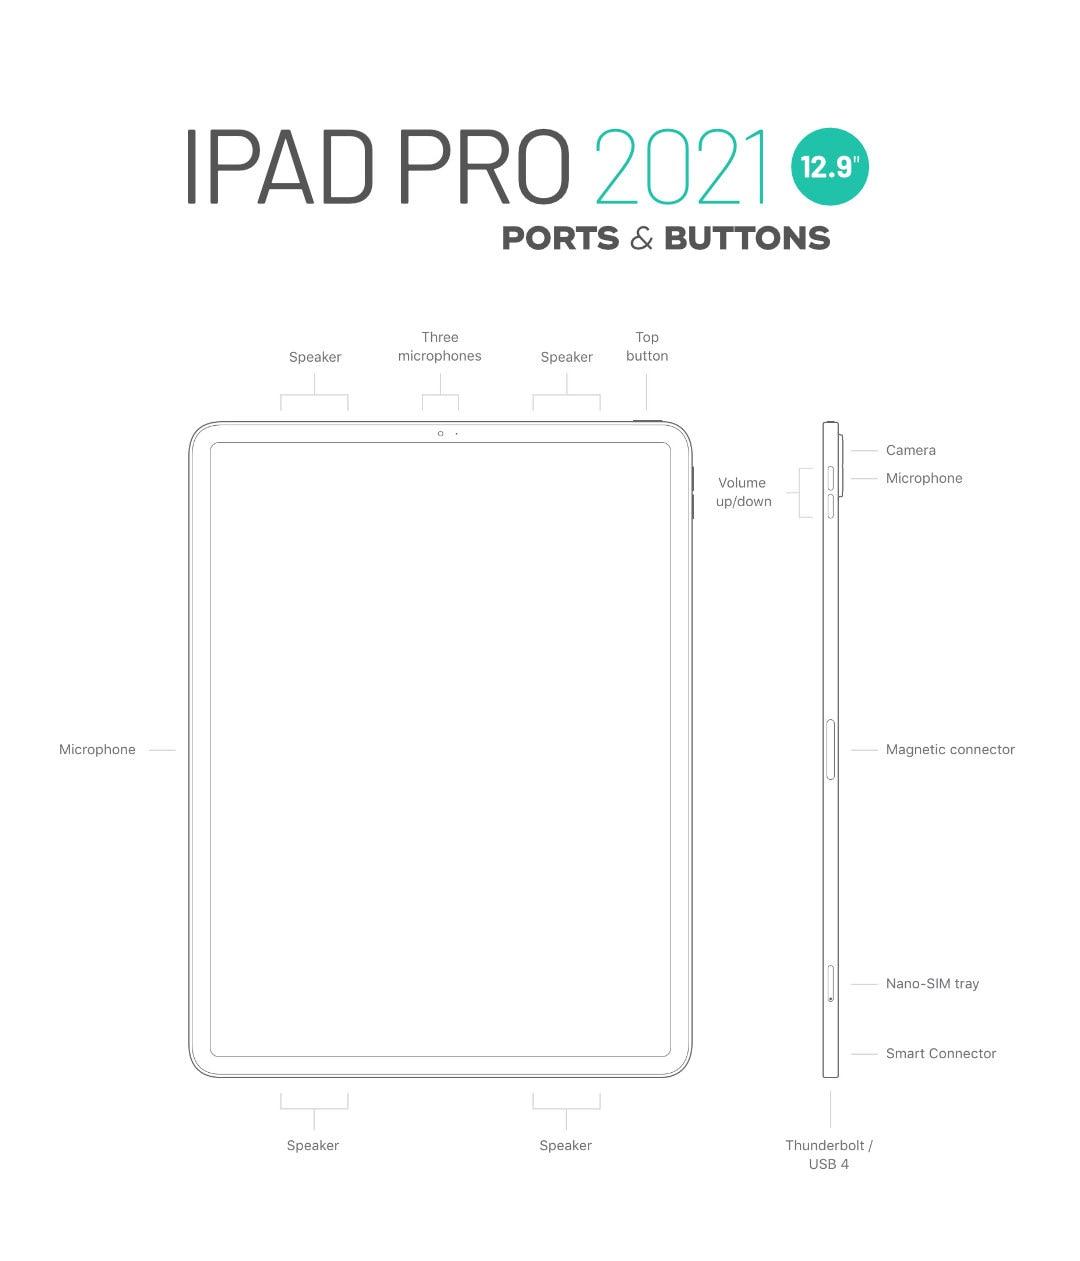 iPad Pro 12.9 2021 connectors ports speakers